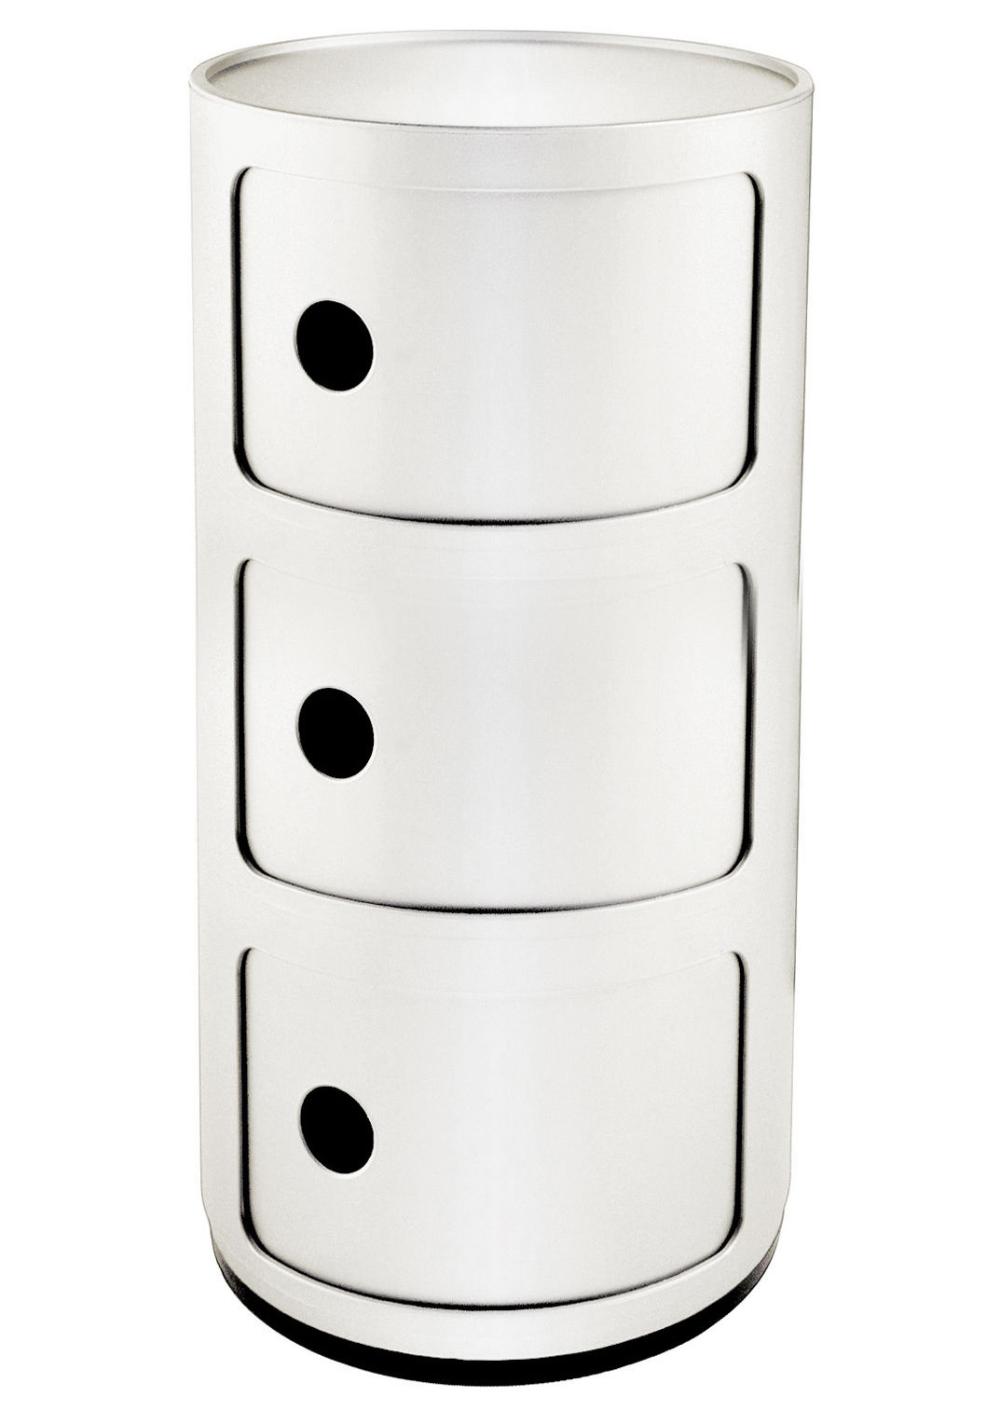 Rangement Componibili 3 Tiroirs H 58 Cm Blanc Kartell Made In Design Kartell Petit Rangement Tiroir